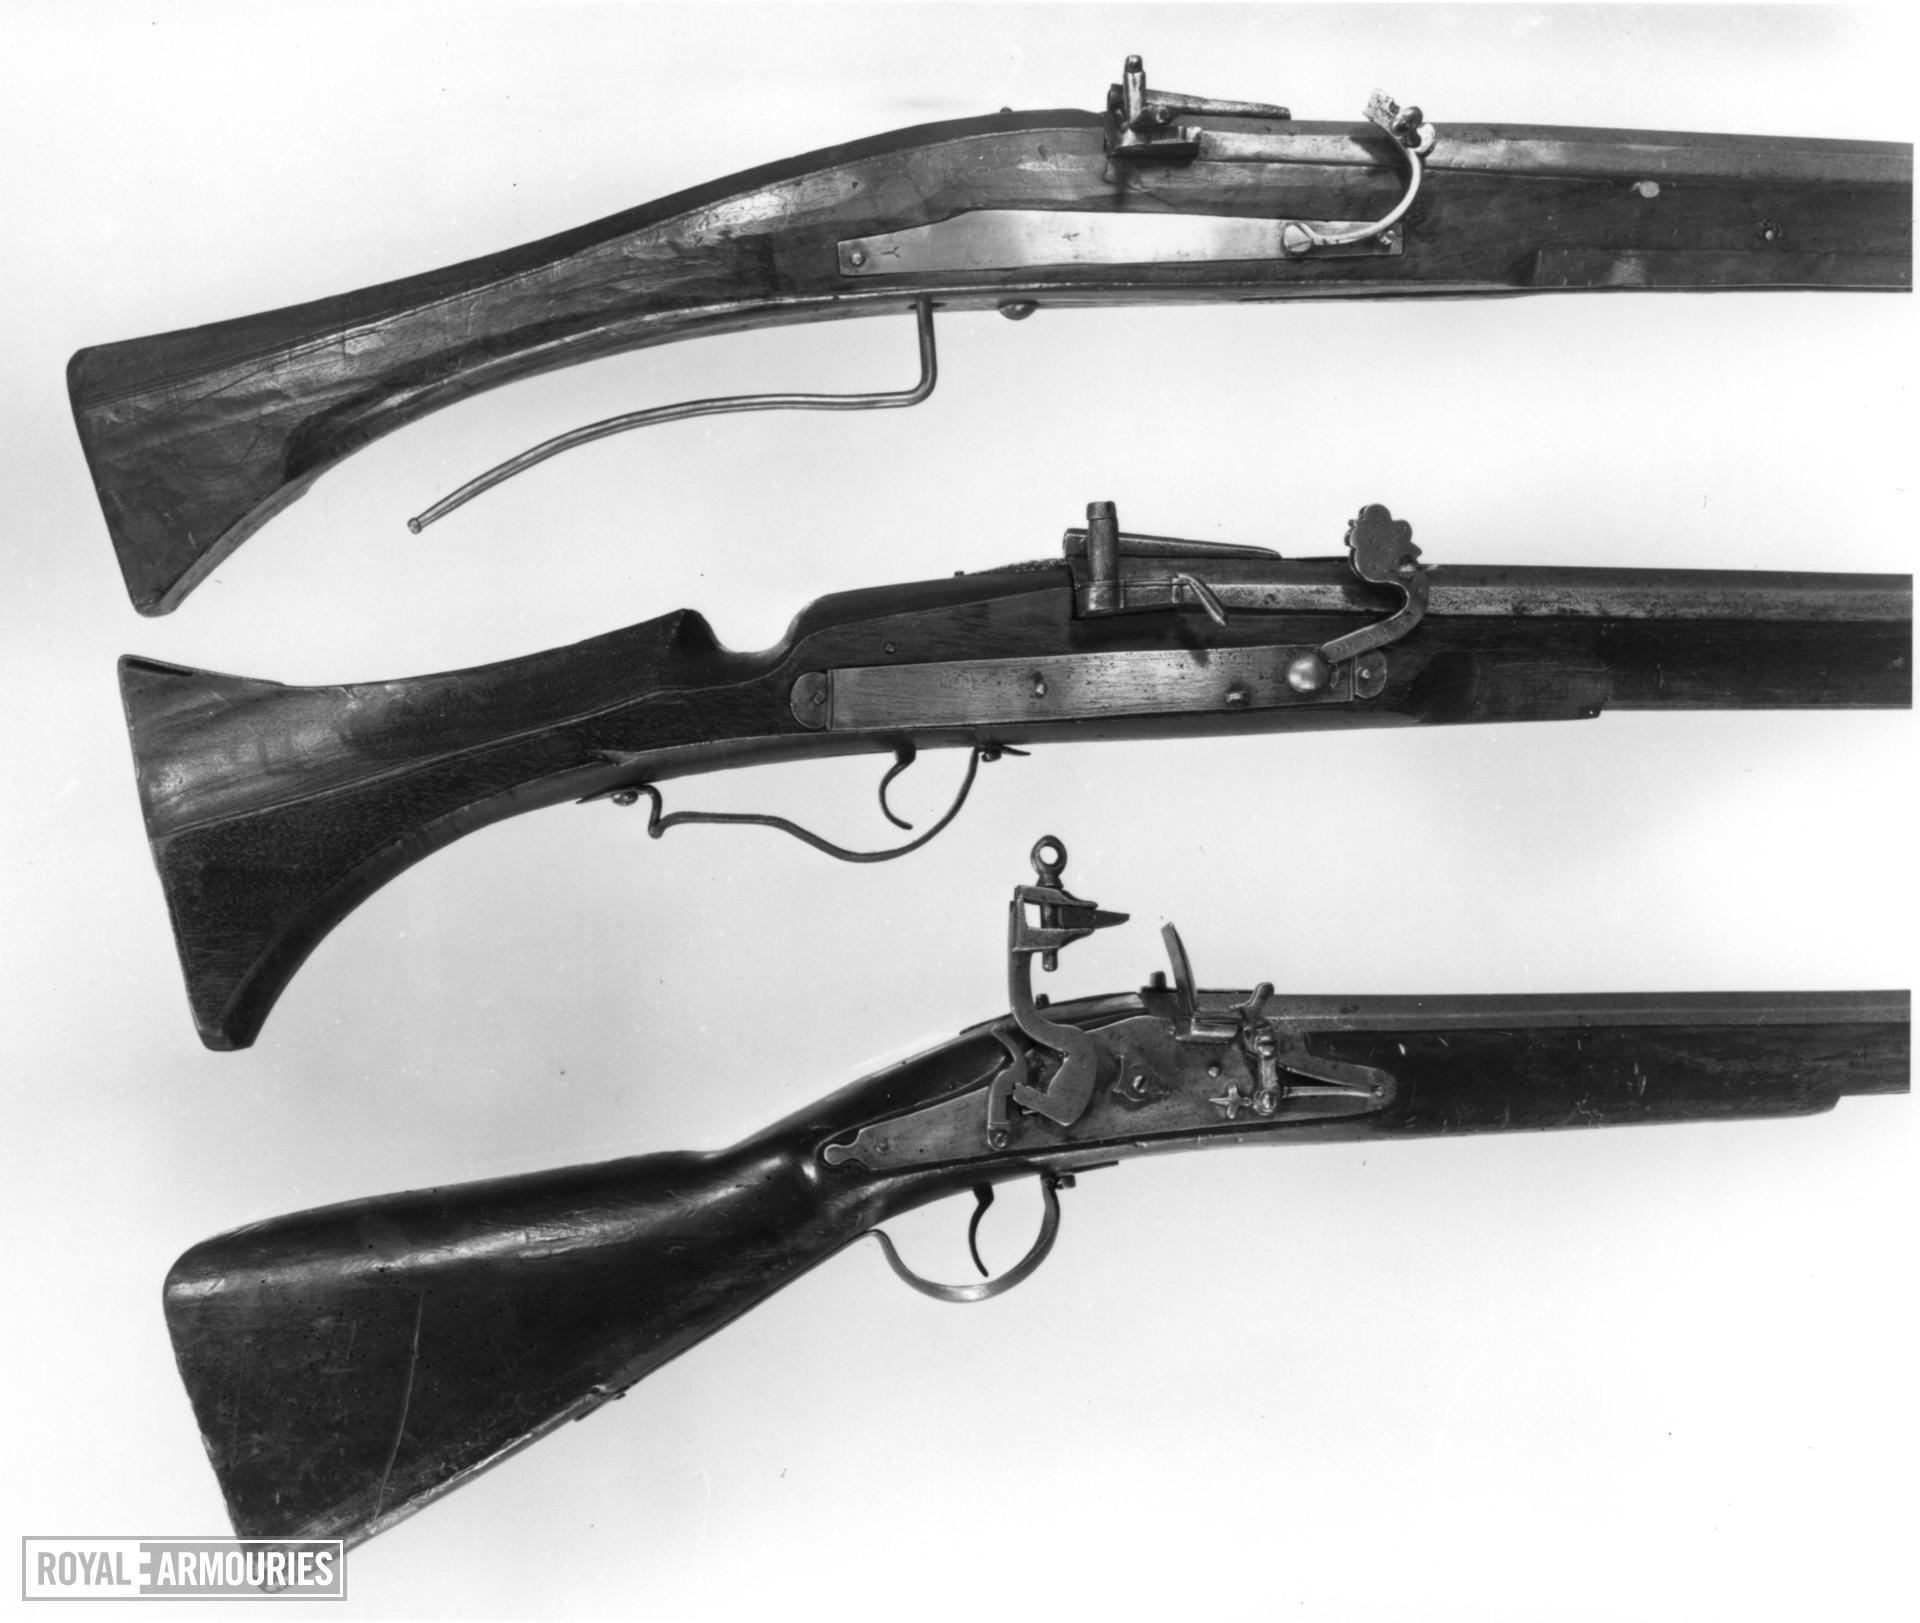 Matchlock muzzle-loading musket - N/A